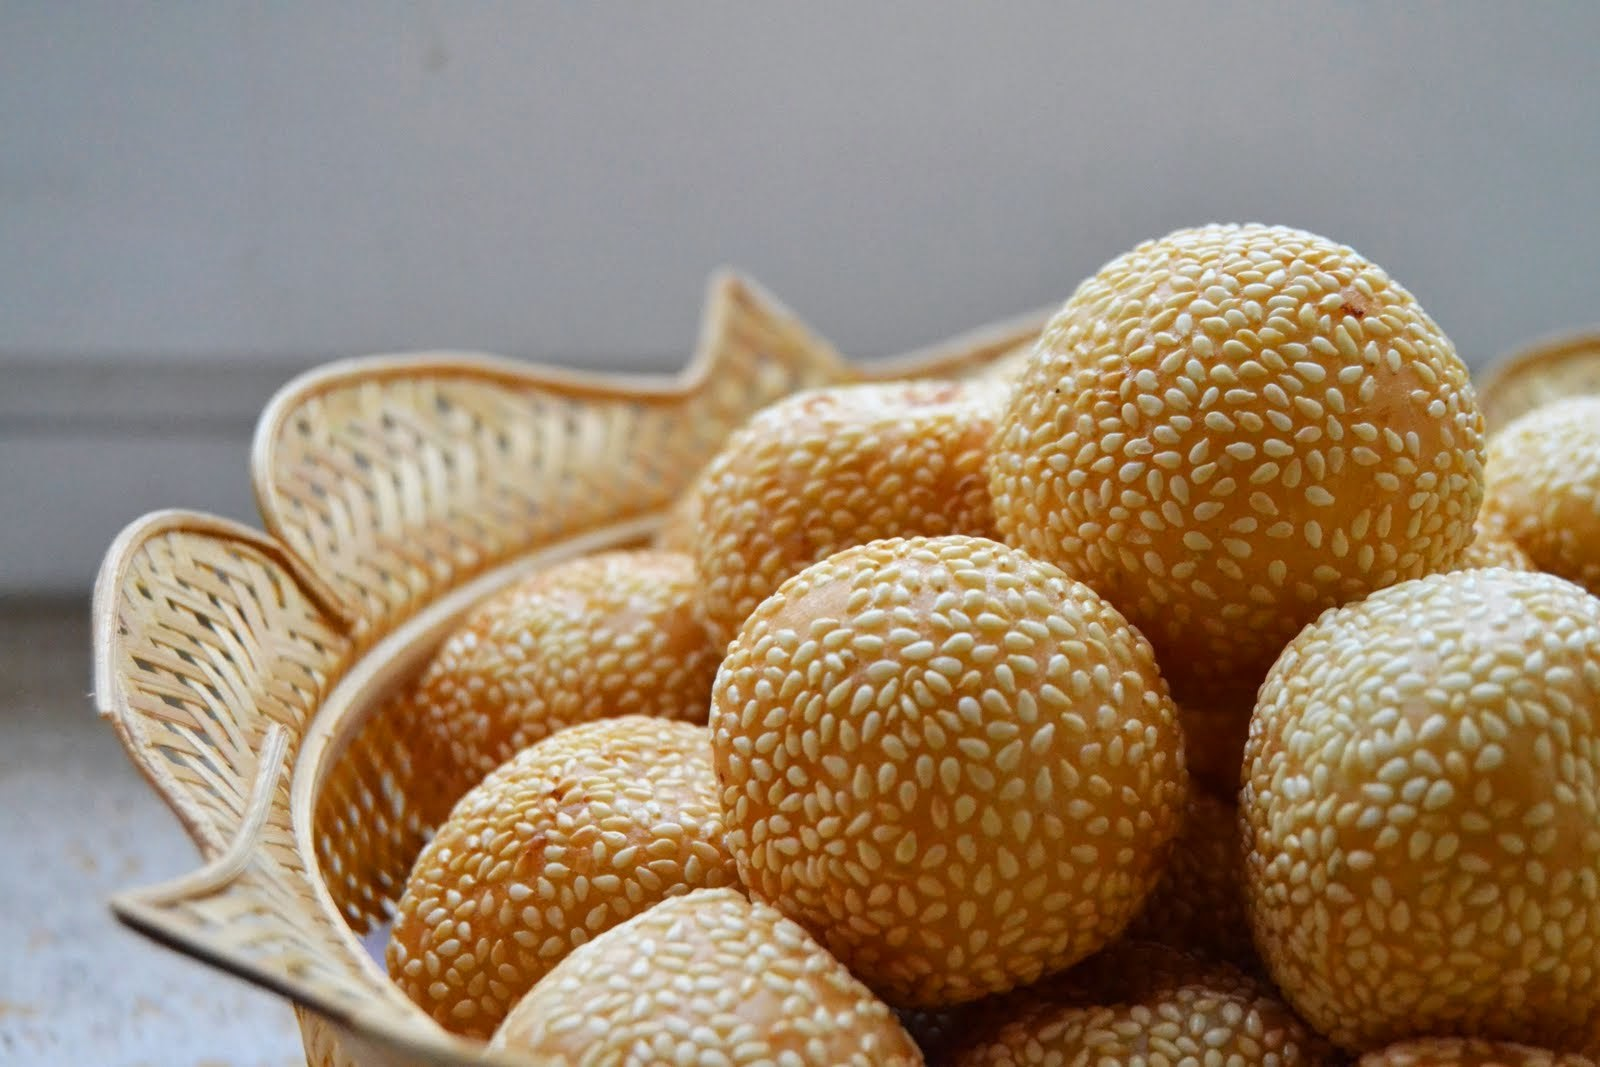 Resep Kue Onde-onde Isi Kacang Hijau - Koleksi Menu